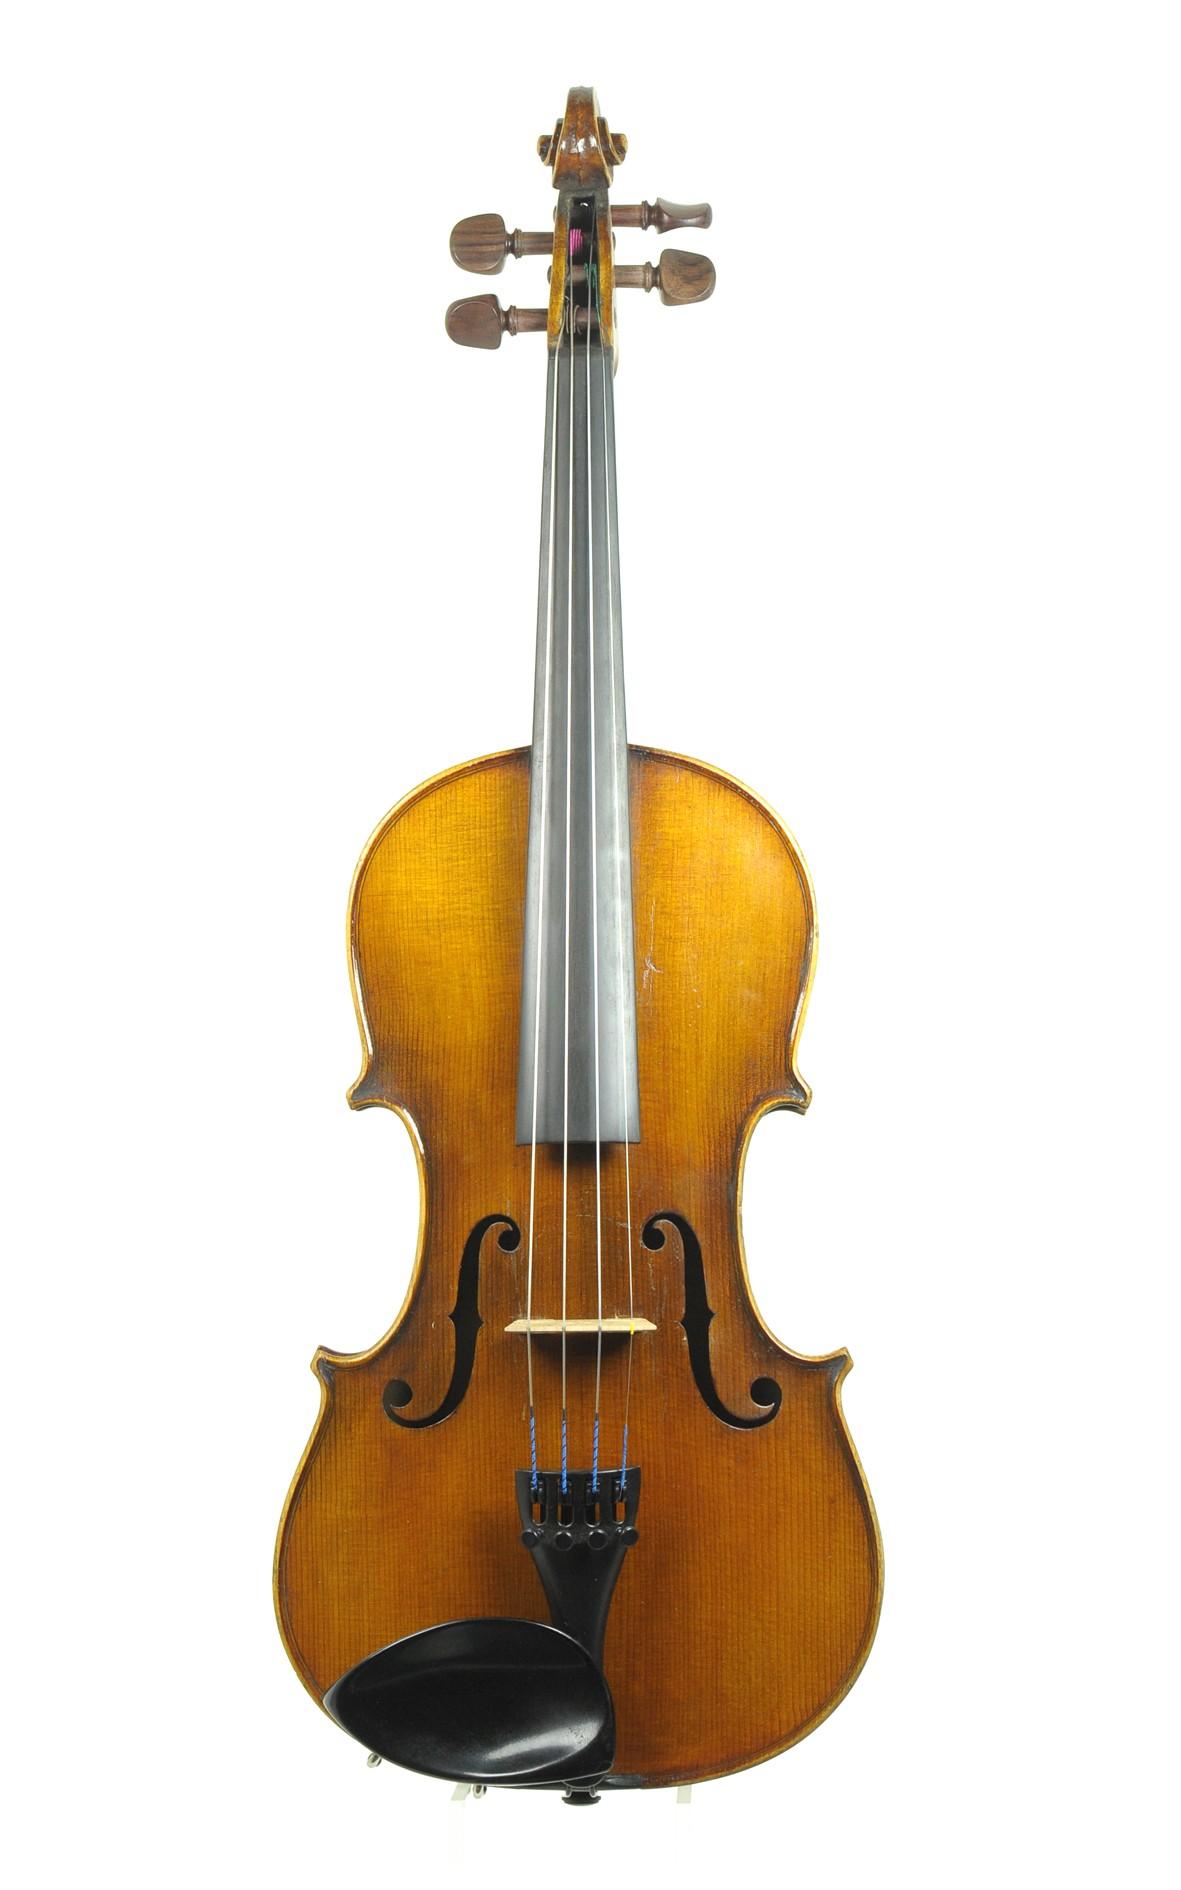 German violin after Da Salo, approx. 1920